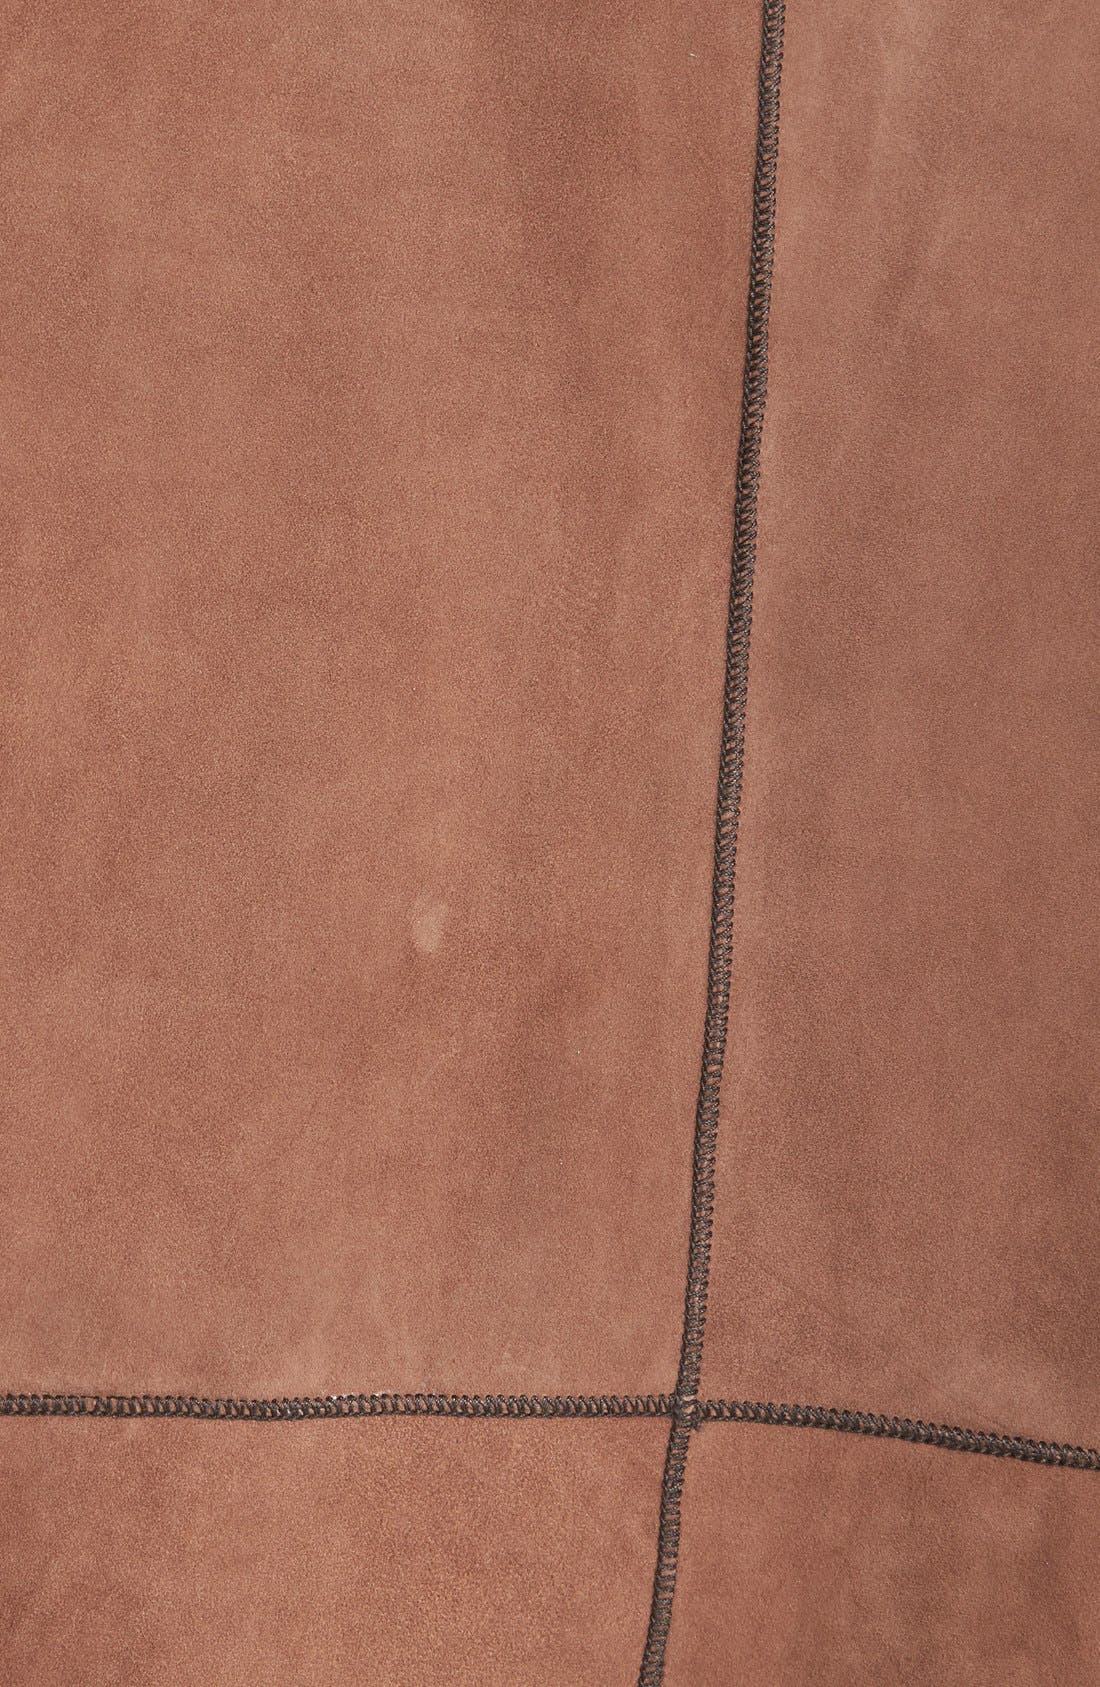 Reversible Suede Jacket,                             Alternate thumbnail 5, color,